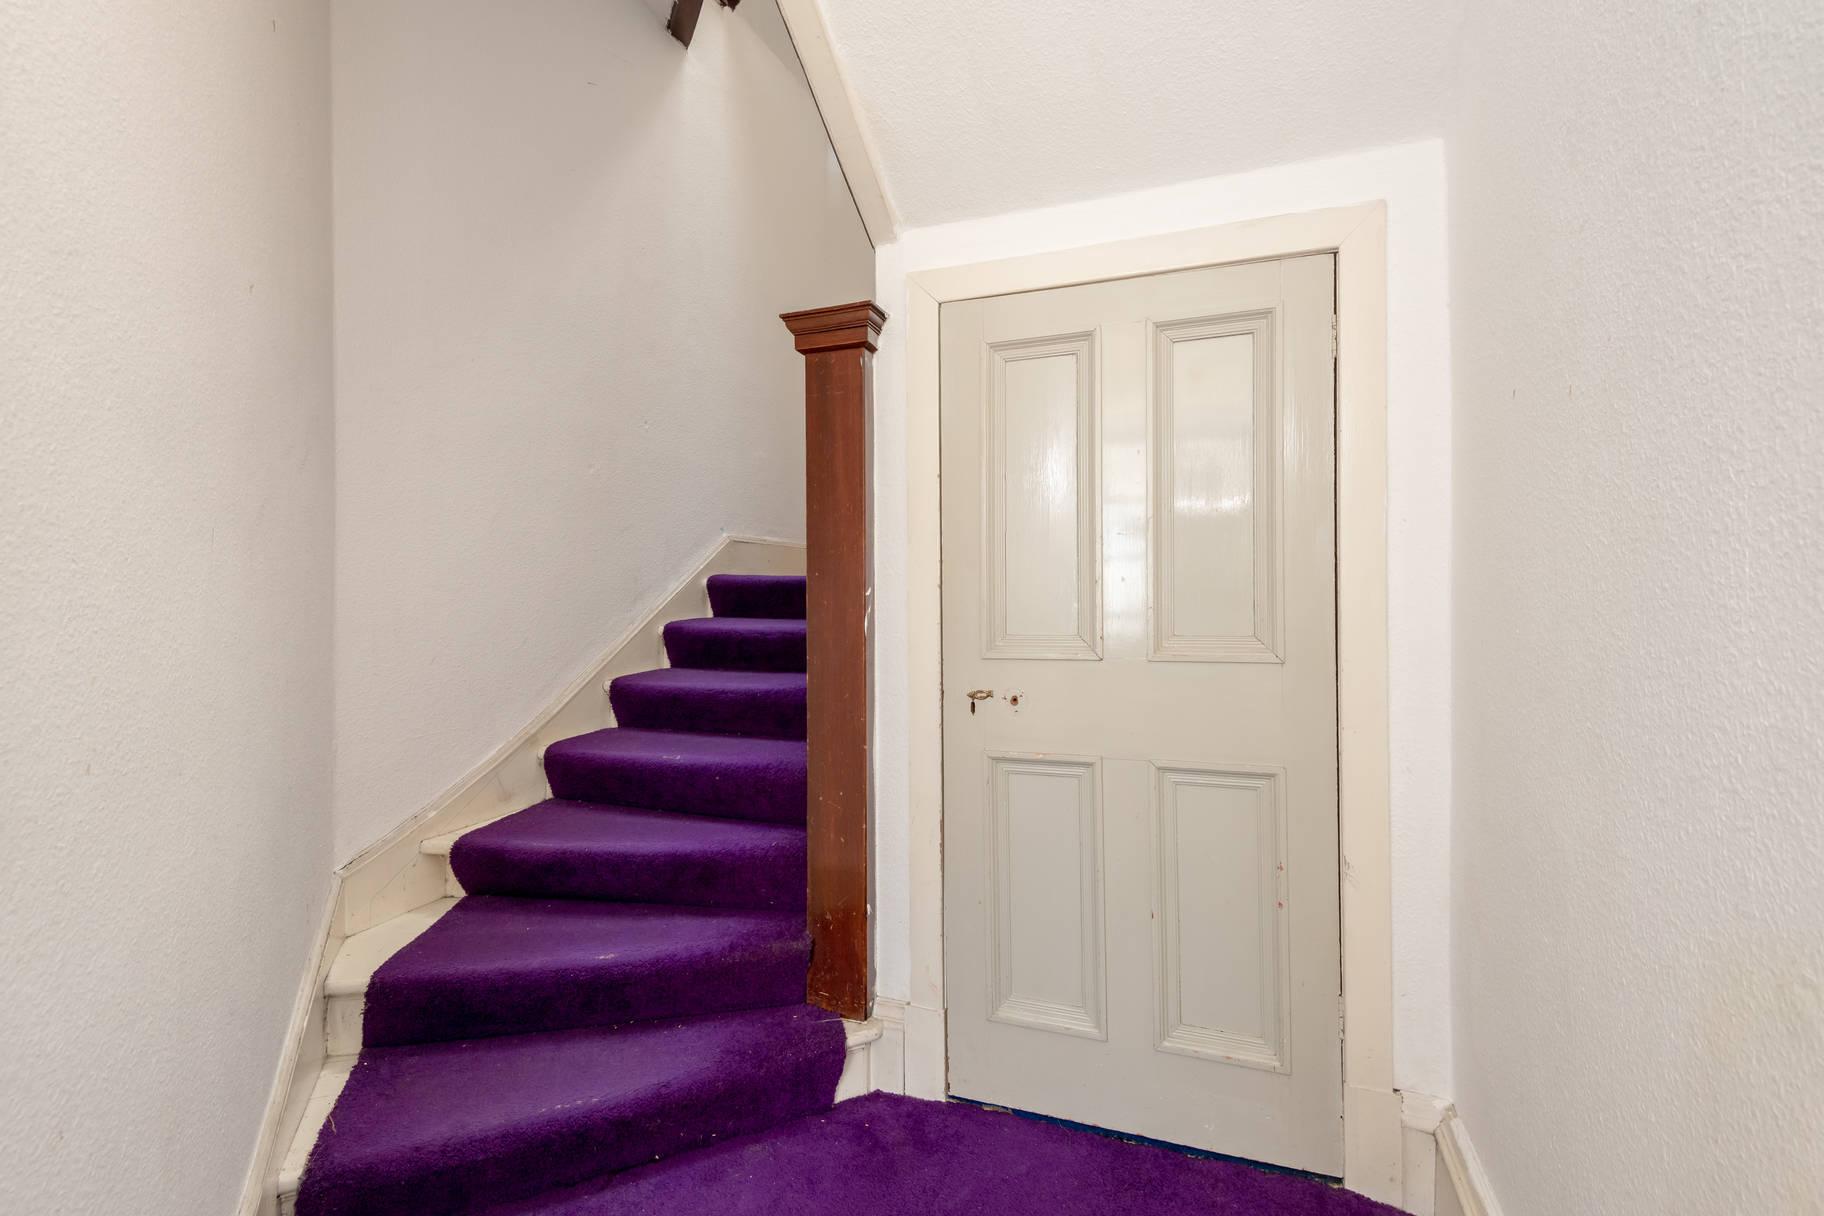 110 Polwarth Terrace, Edinburgh, EH11 1NN